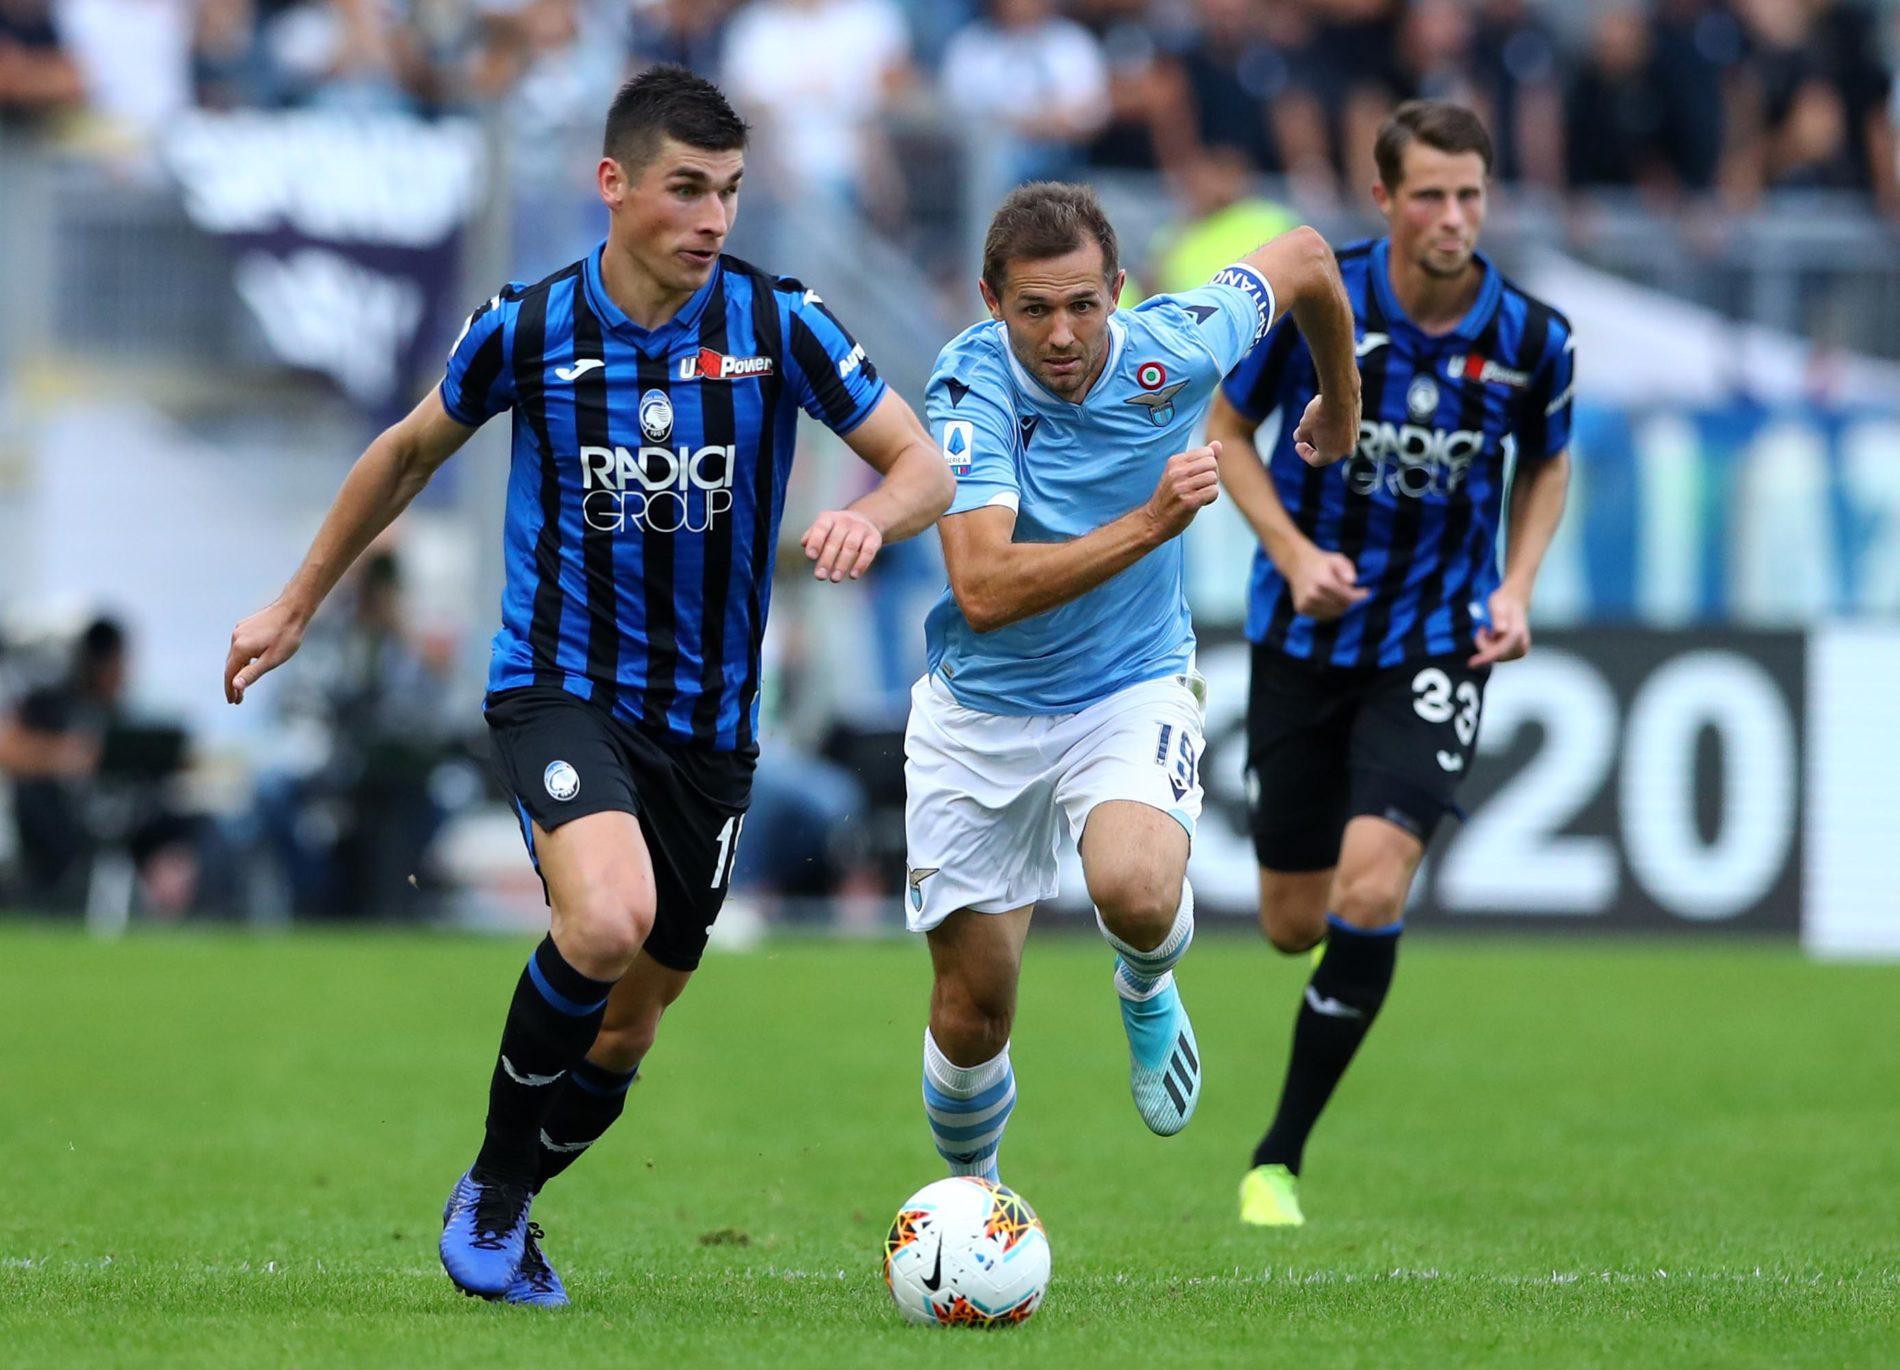 Lazio - Atalanta, Senad Lulic e Ruslan Malinovskyi